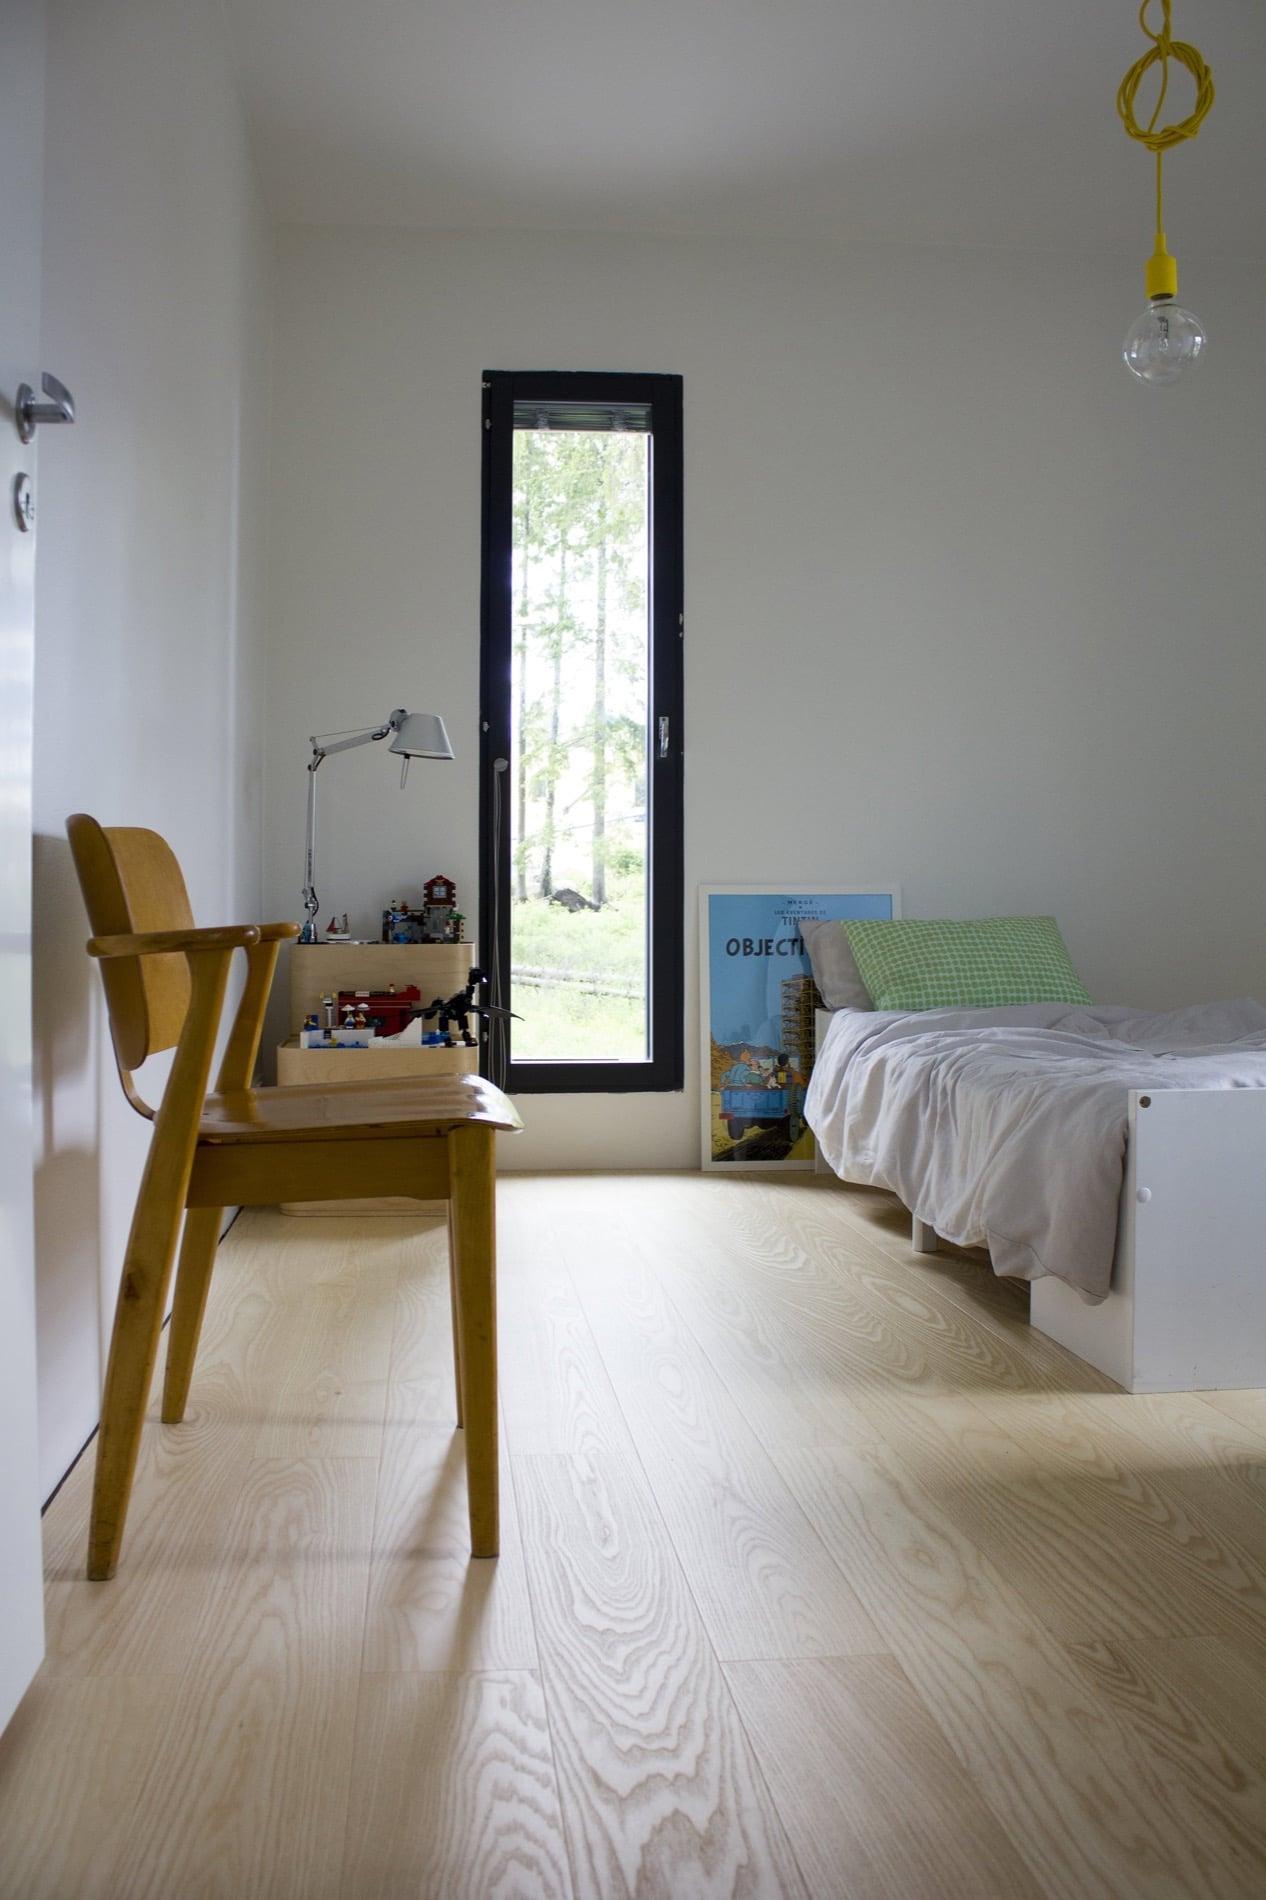 Timberwise parketti puulattia wooden floor parquet Saarni Ash Select îljyvaha wax oil_pysty2